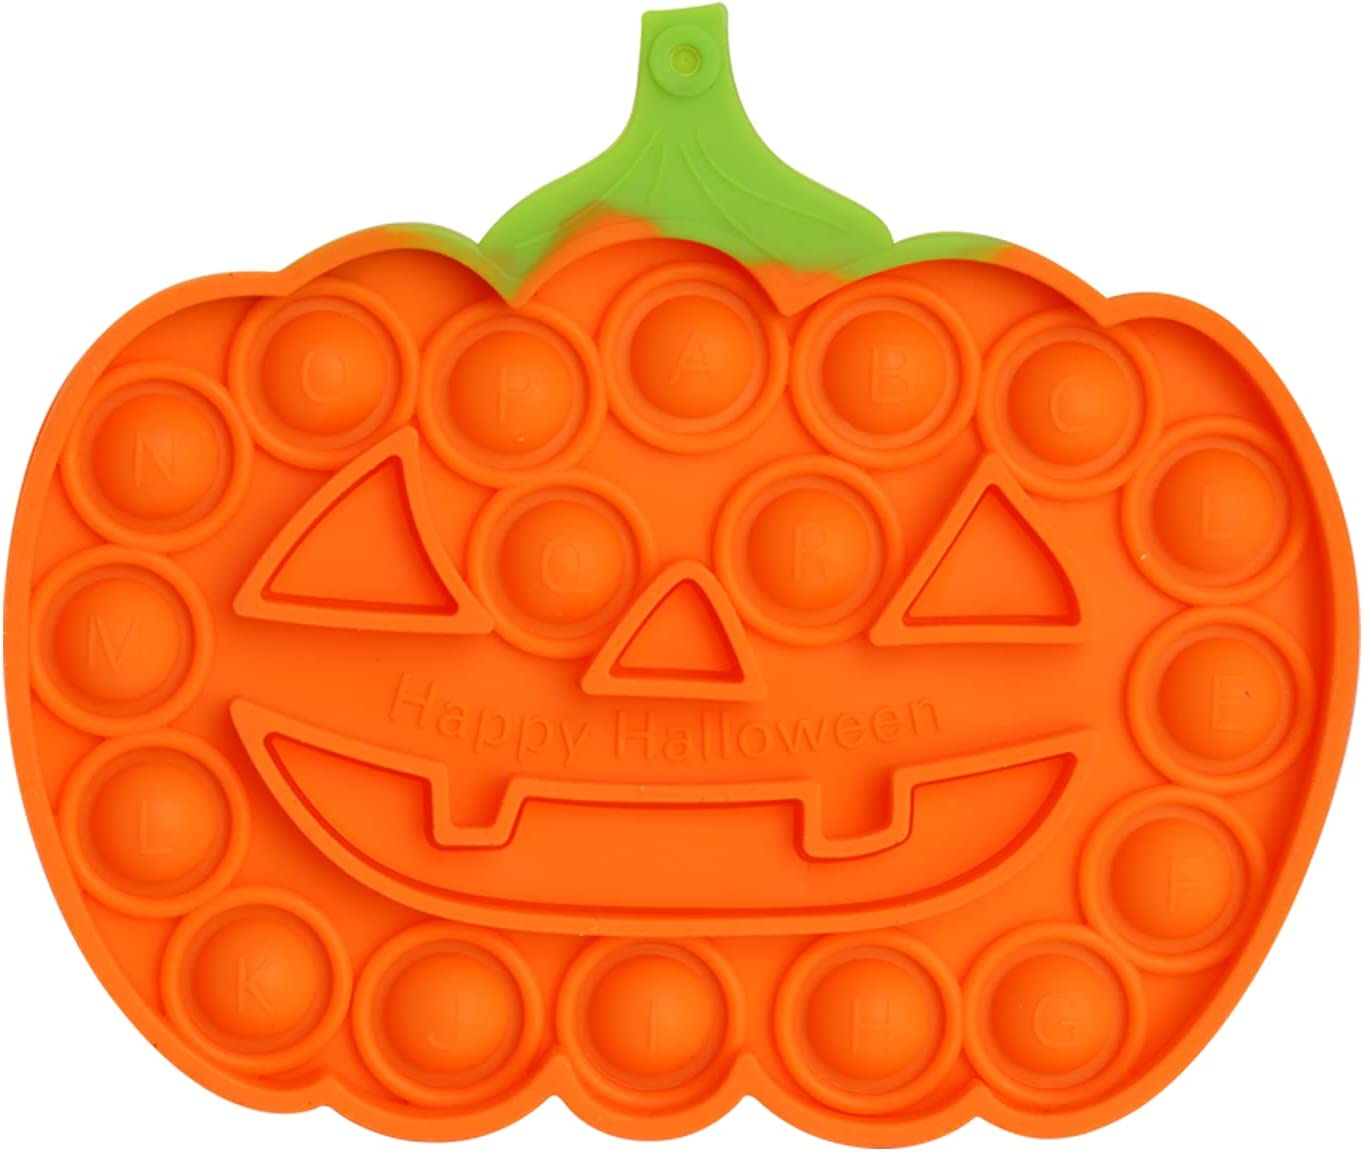 TXDRRA Pumpkin Push Bubble Fidget Bu Ranking TOP3 Stress Relief Silicone Toys 35% OFF